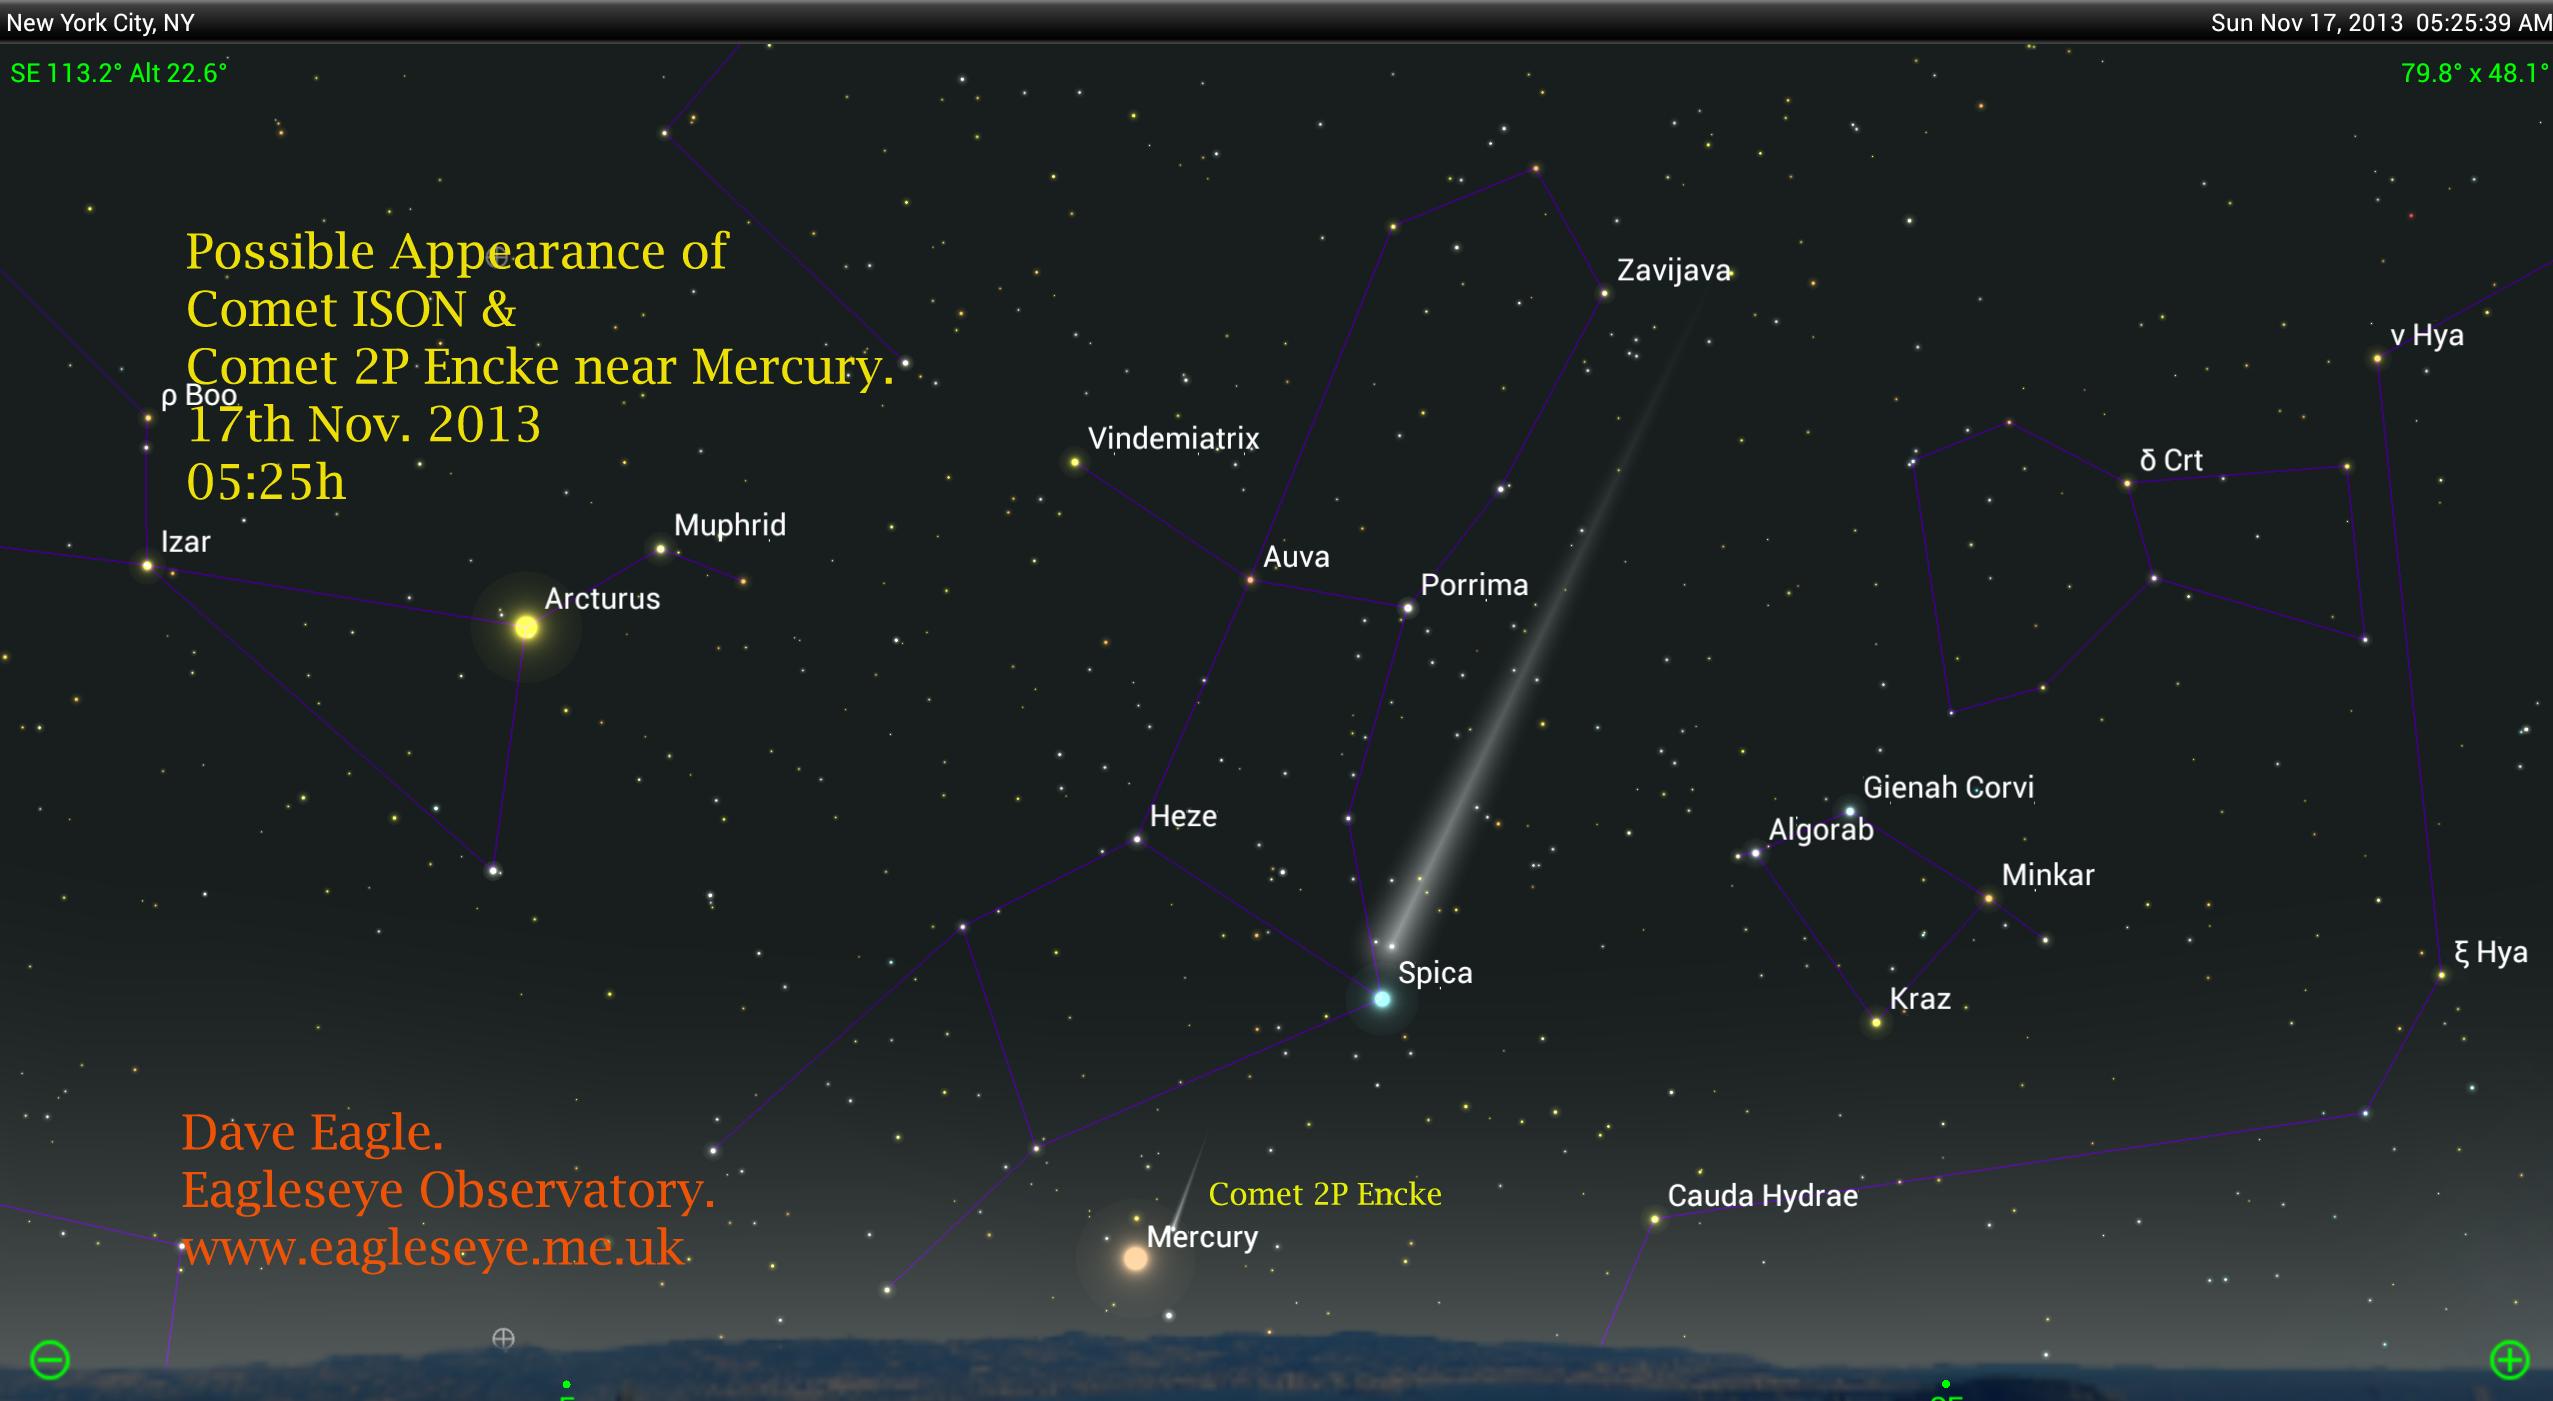 Comet ISON, C/2012 S1 & 2P/Encke Will Perihelion A Week ...